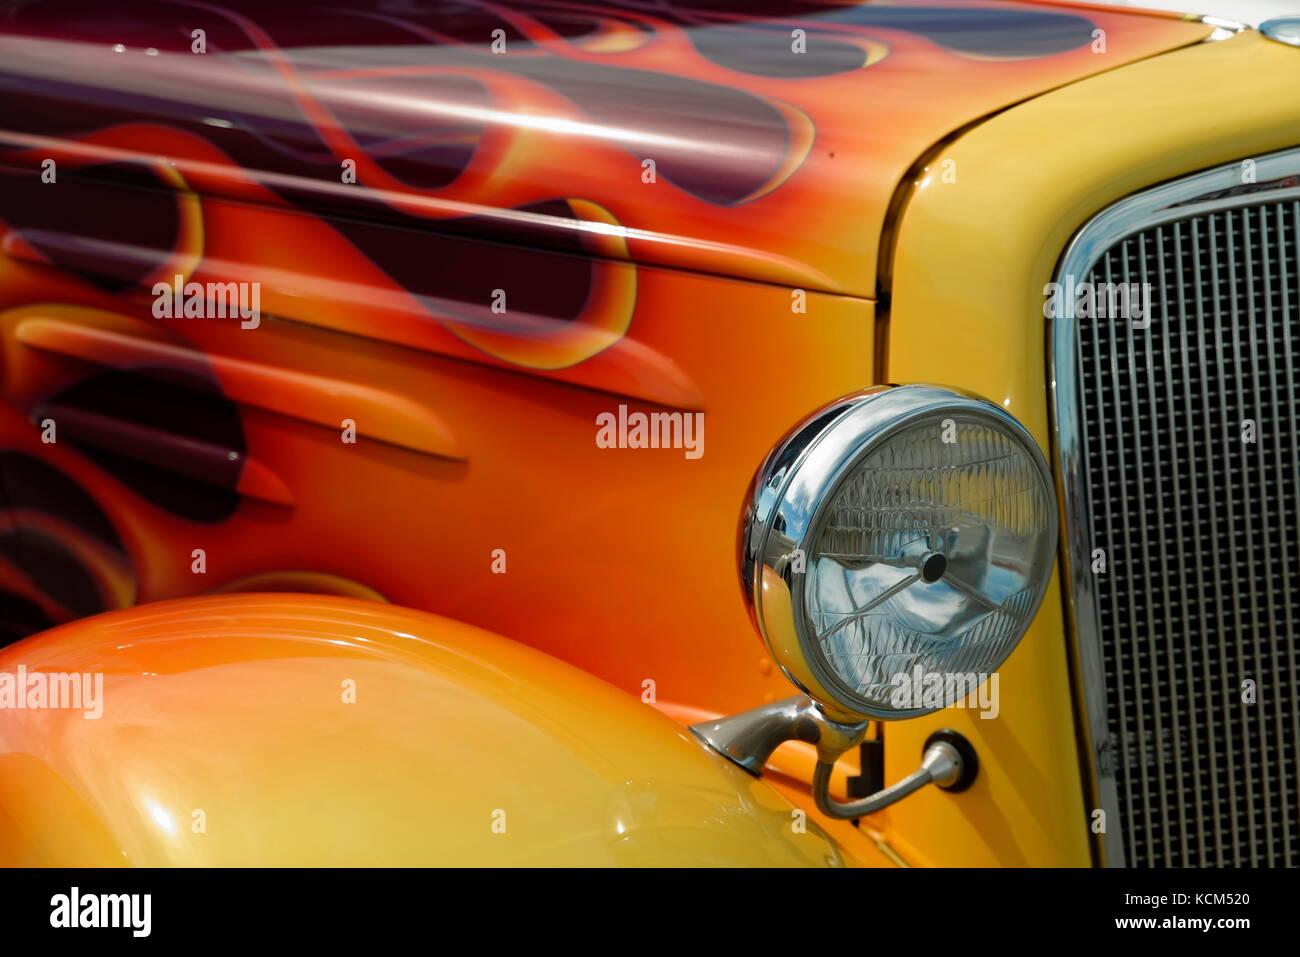 Hot Rod Flames Stock Photos & Hot Rod Flames Stock Images - Alamy